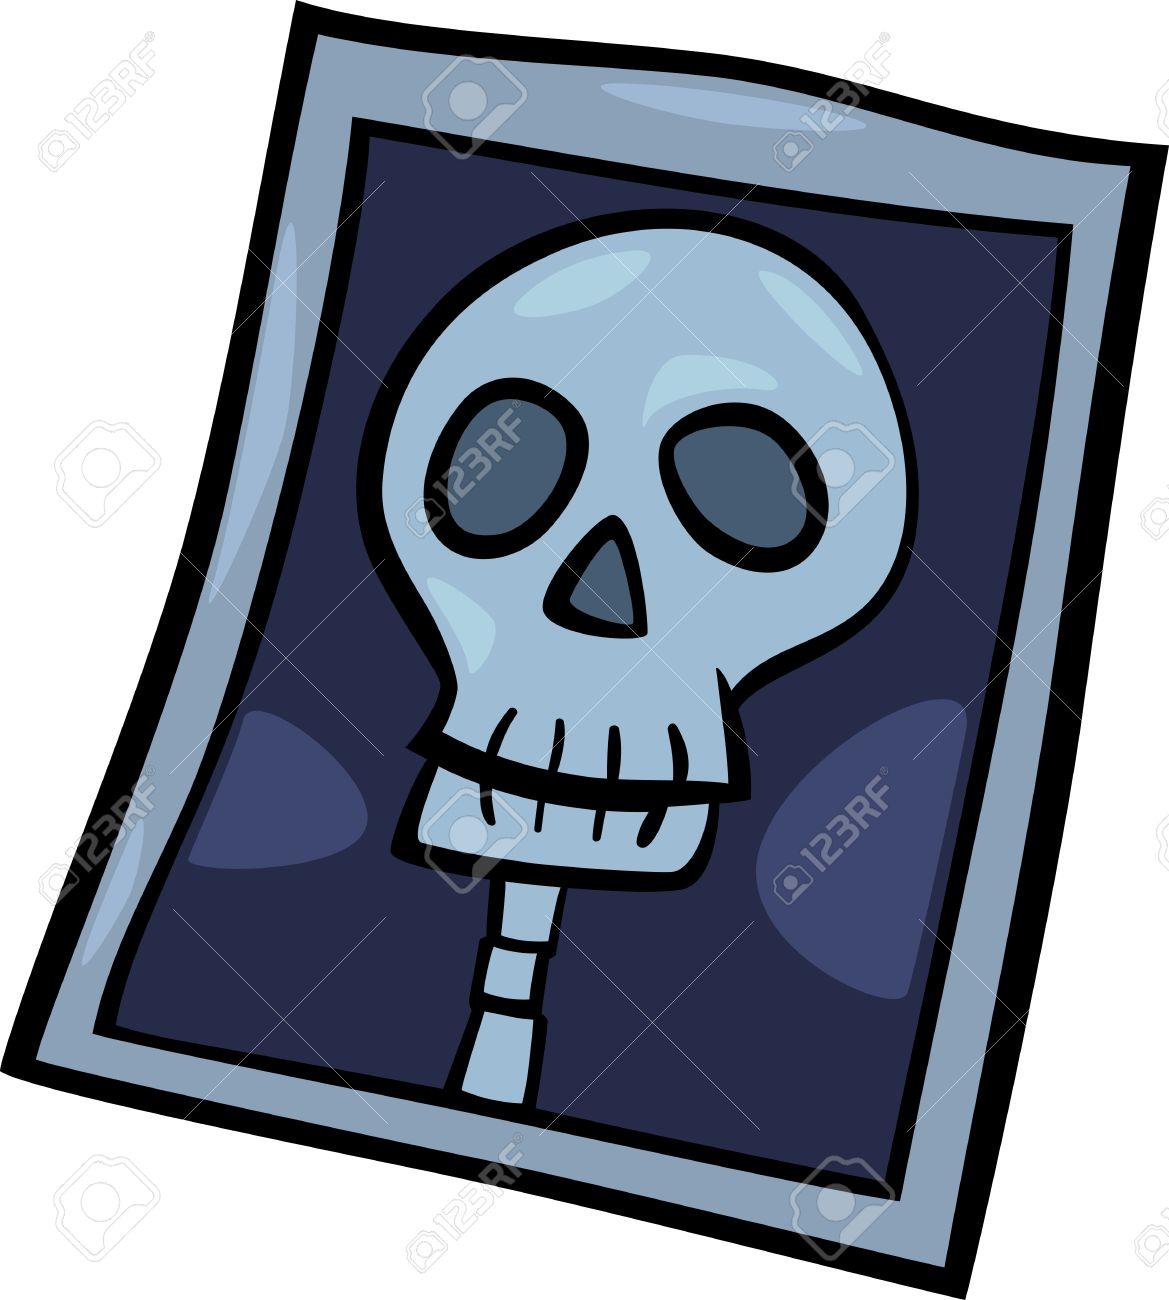 cartoon illustration of x ray photo of human head clip art royalty rh 123rf com x ray clipart png x ray fish clipart